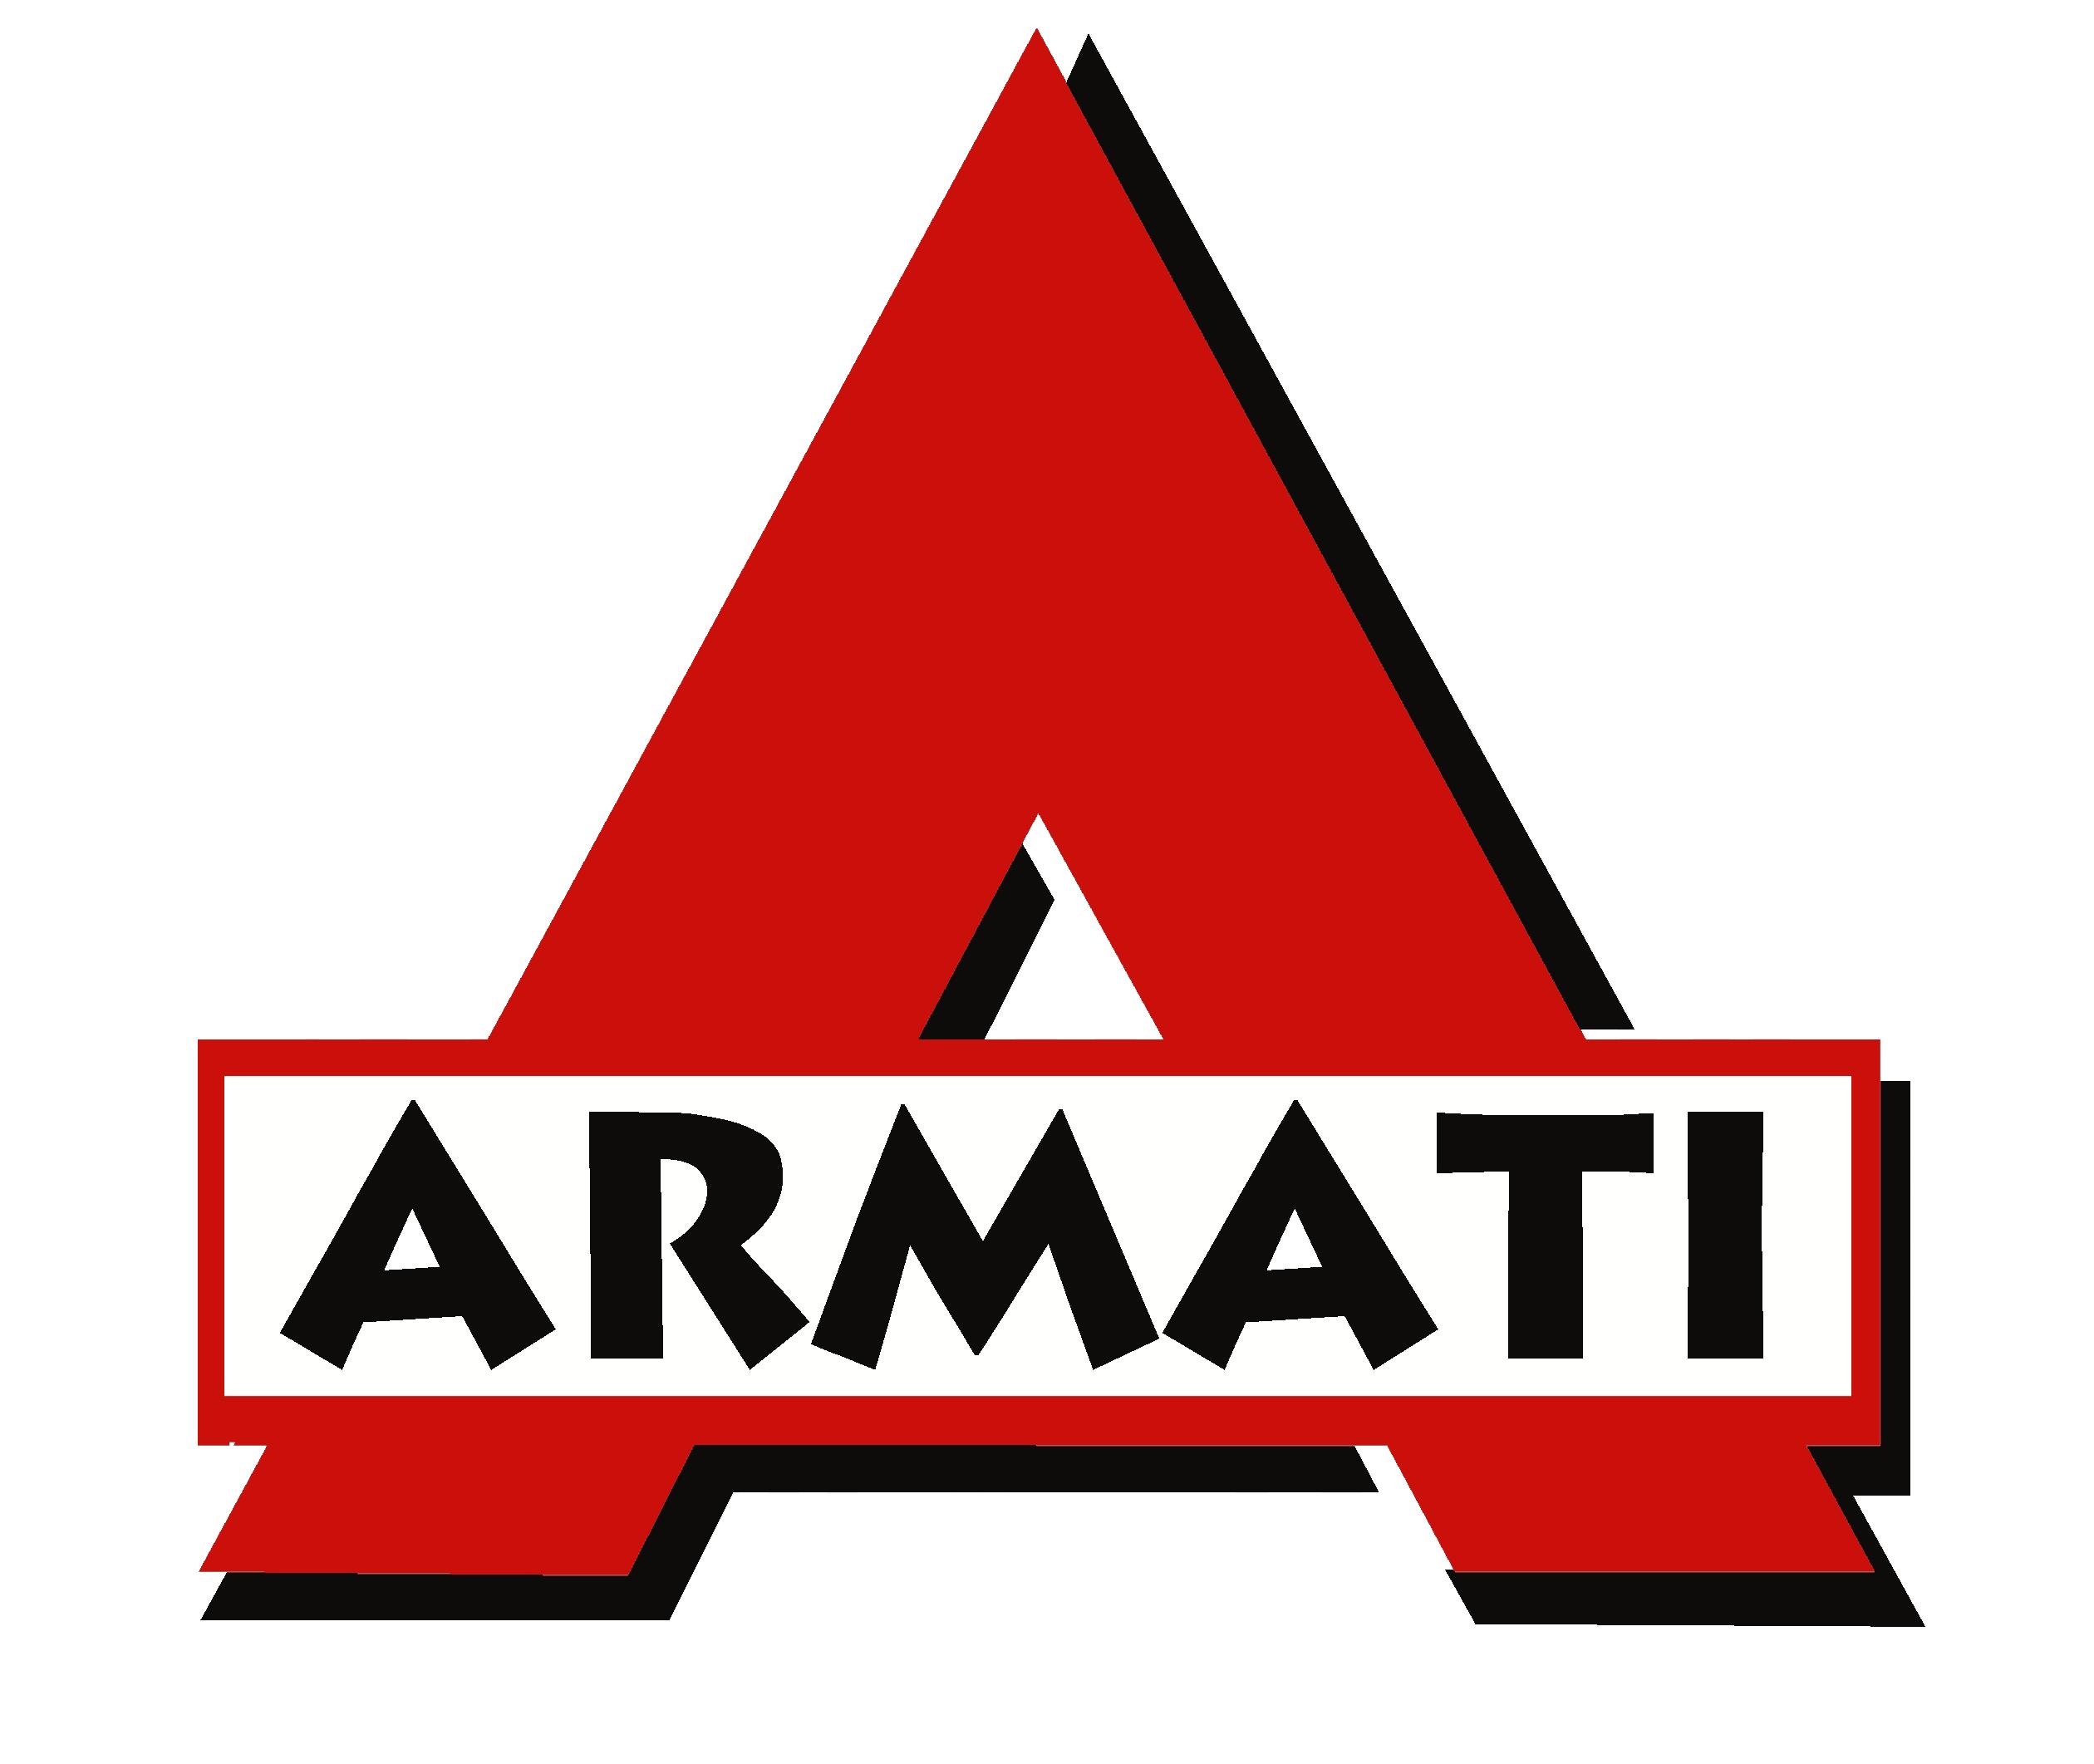 Armaticar